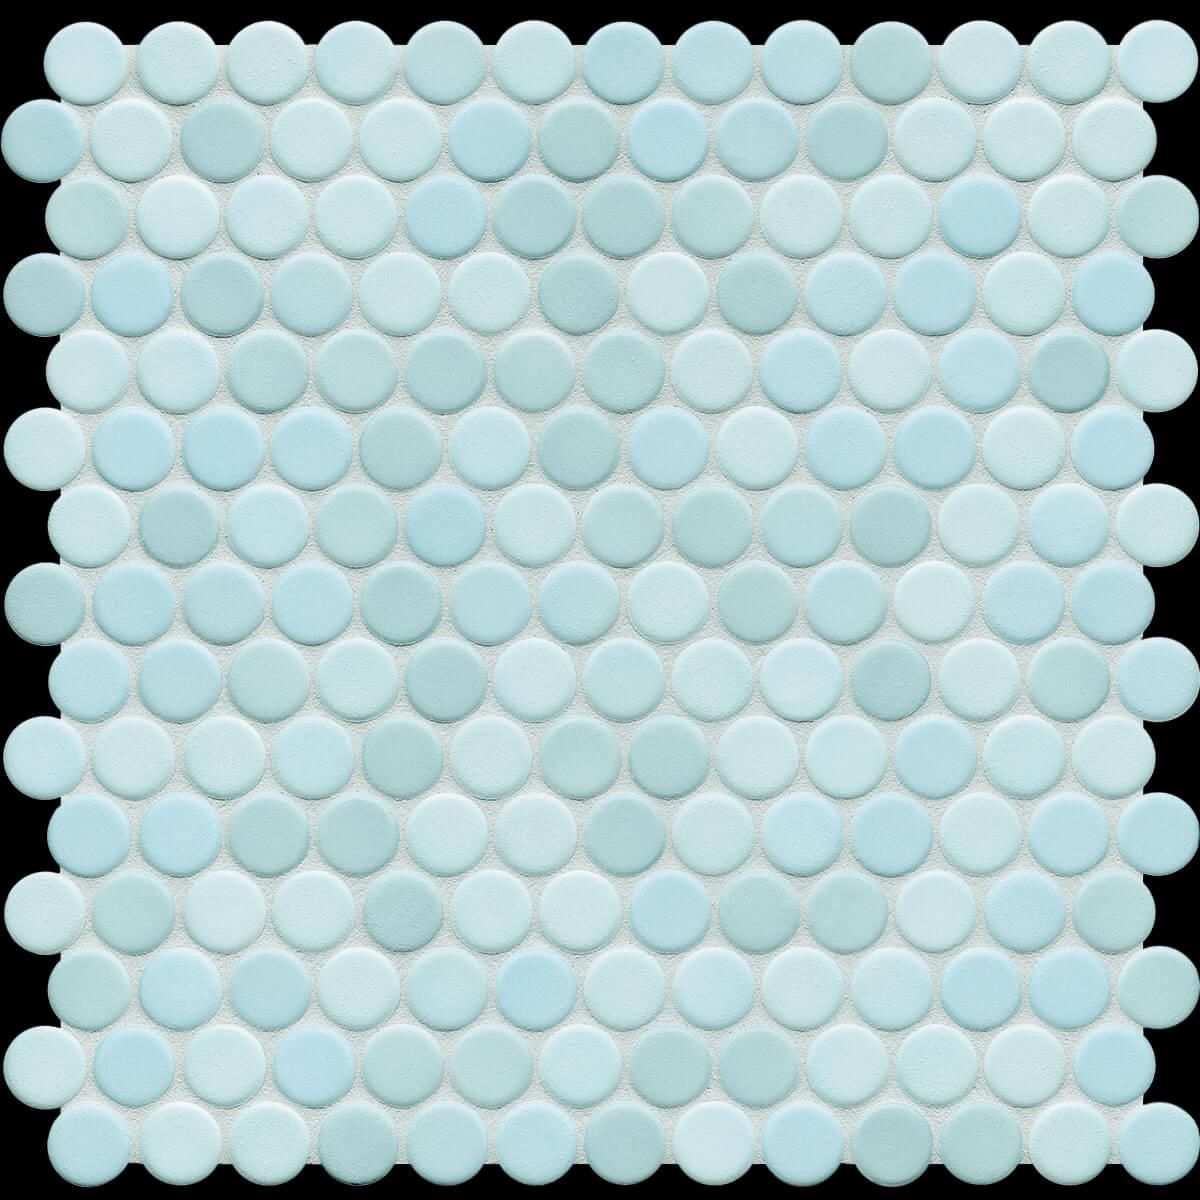 Agrob Buchtal Tiles - KLAY_Loop-_0002_40047H